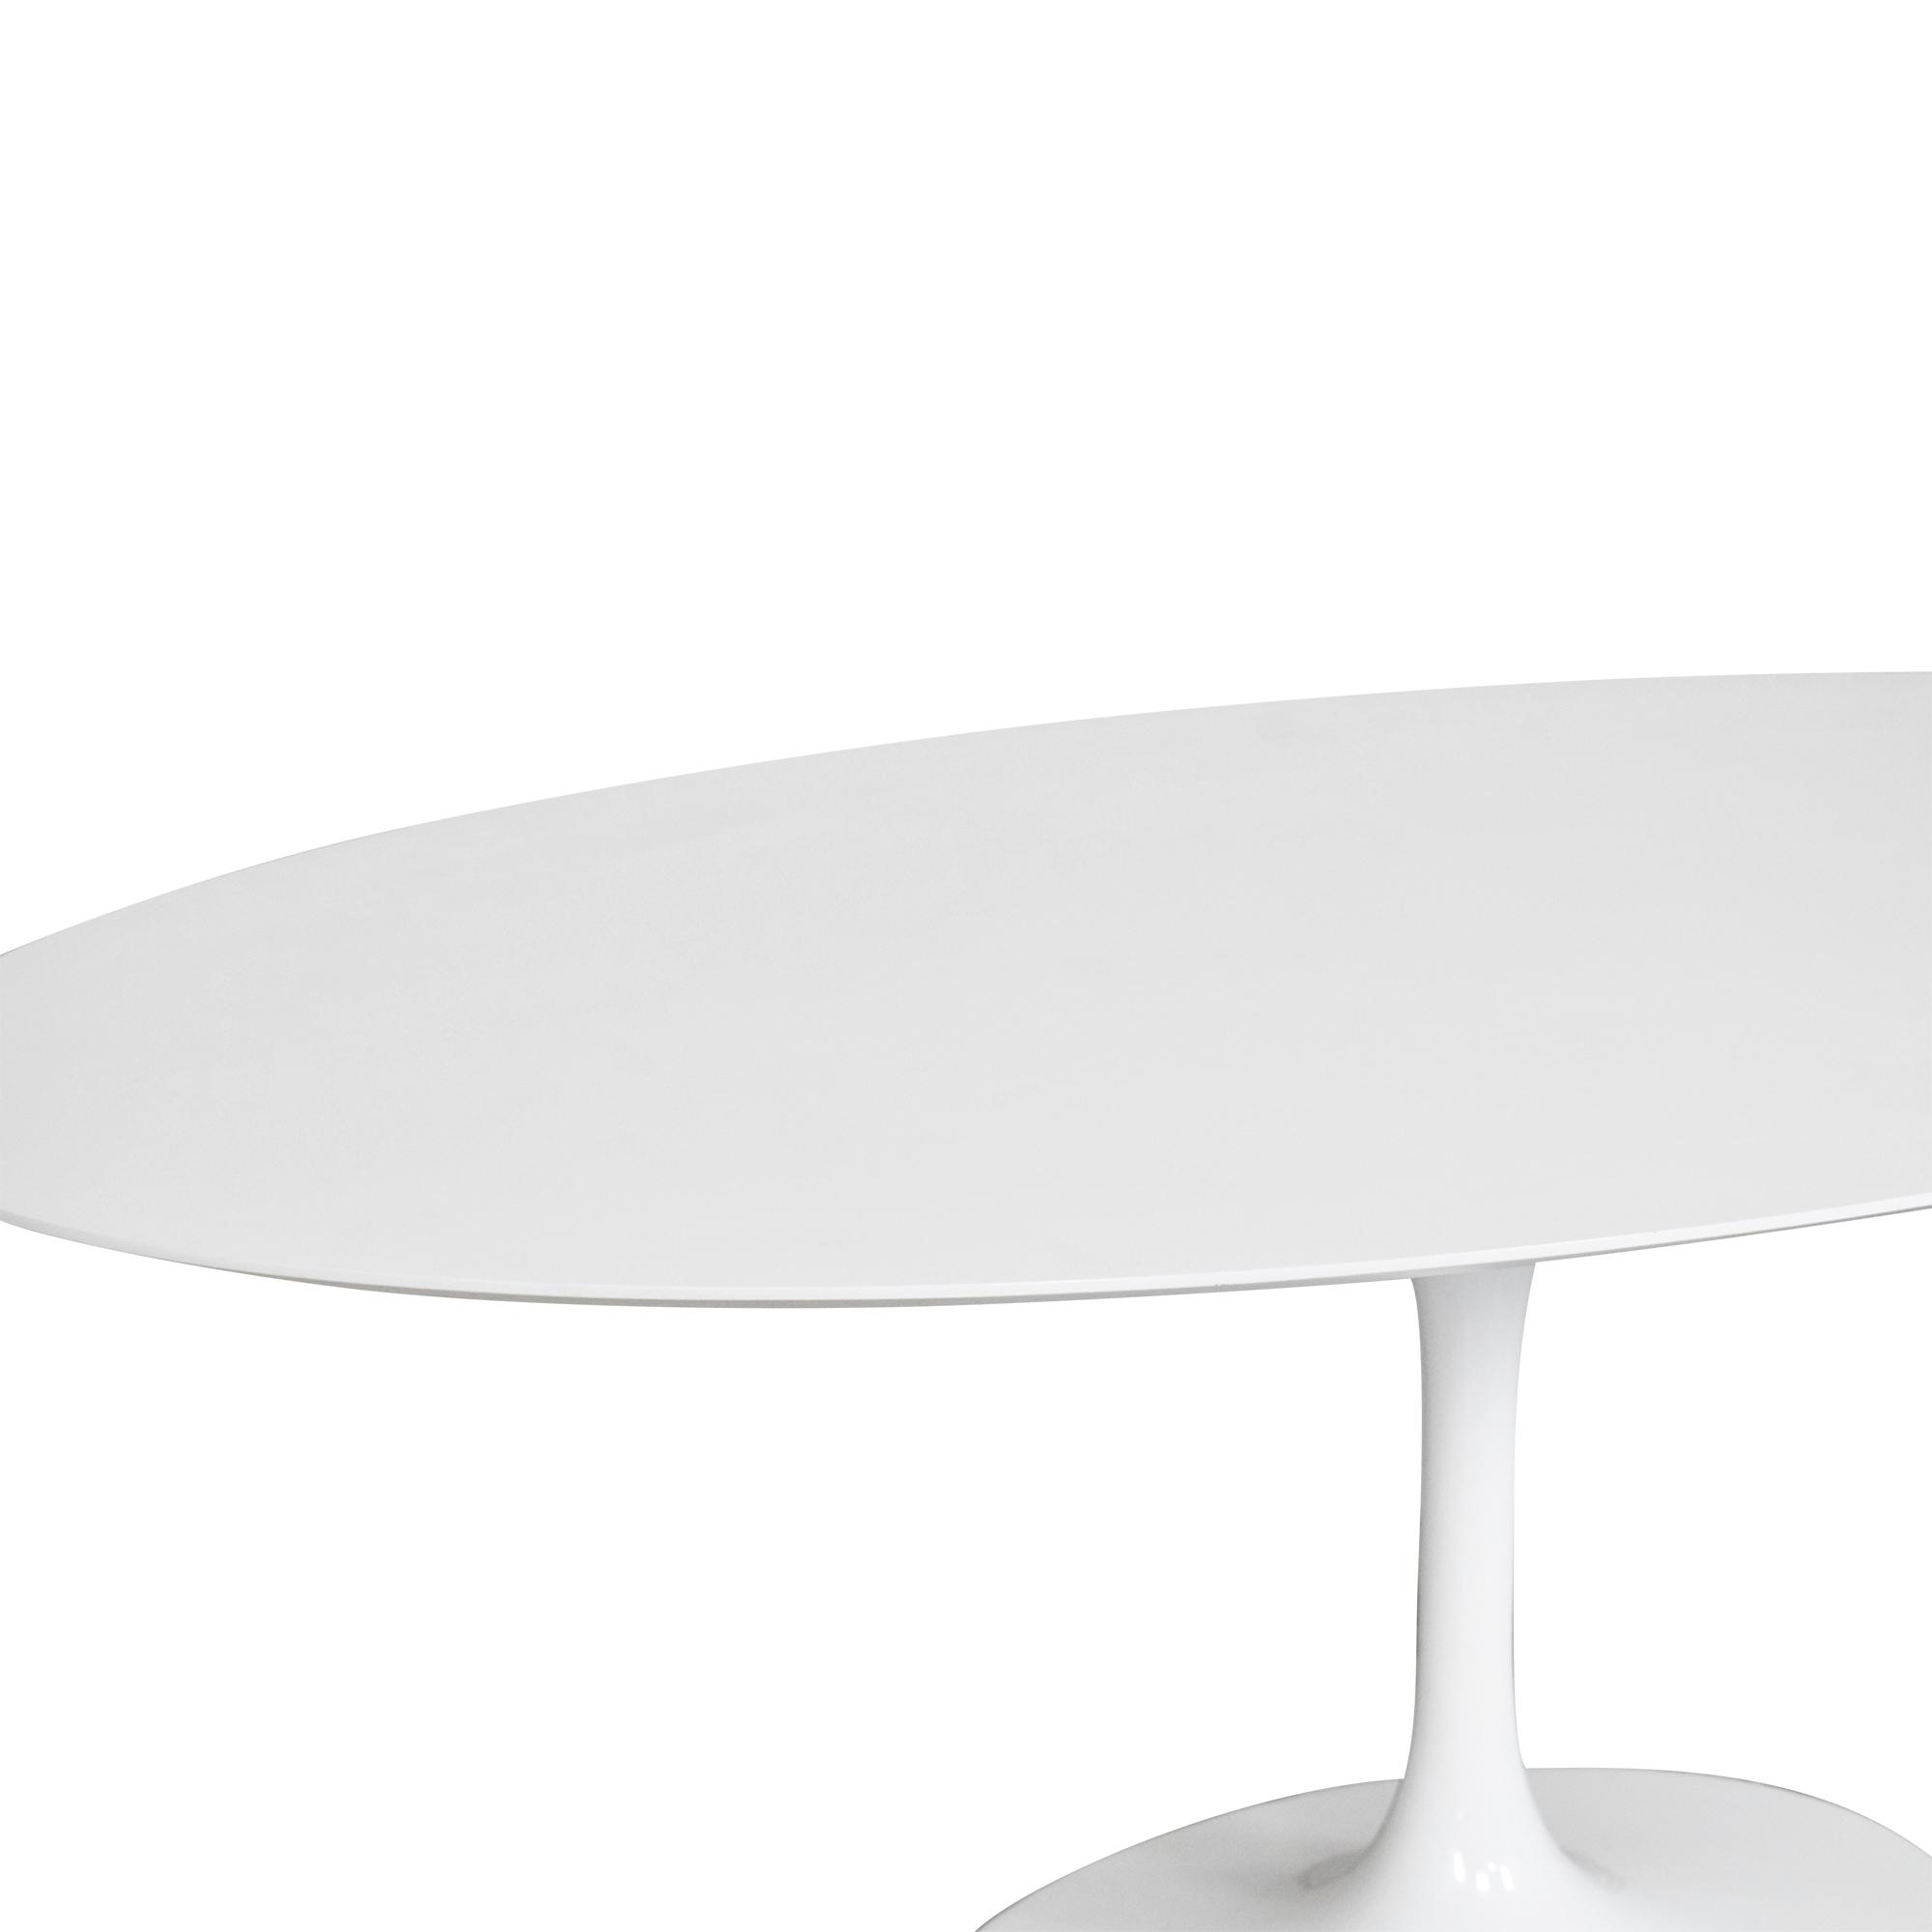 AllModern AllModern Bromyard Oval Dining Table price